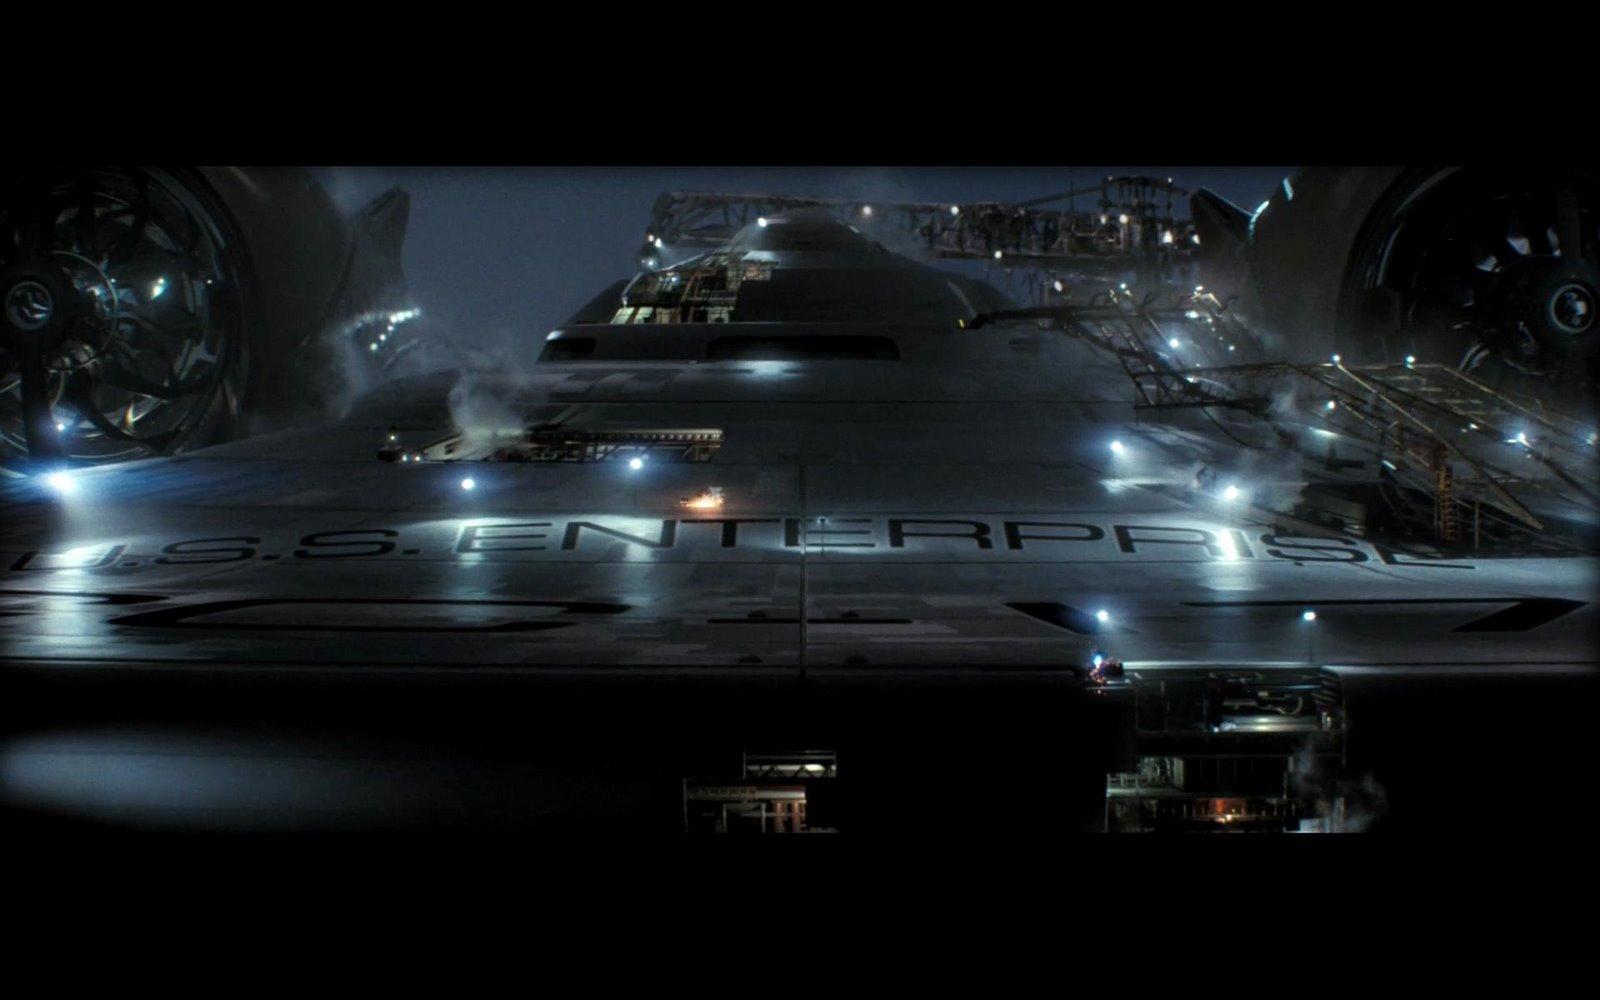 Star Trek Wallpaper USS Enterprise Picture 1600x1000